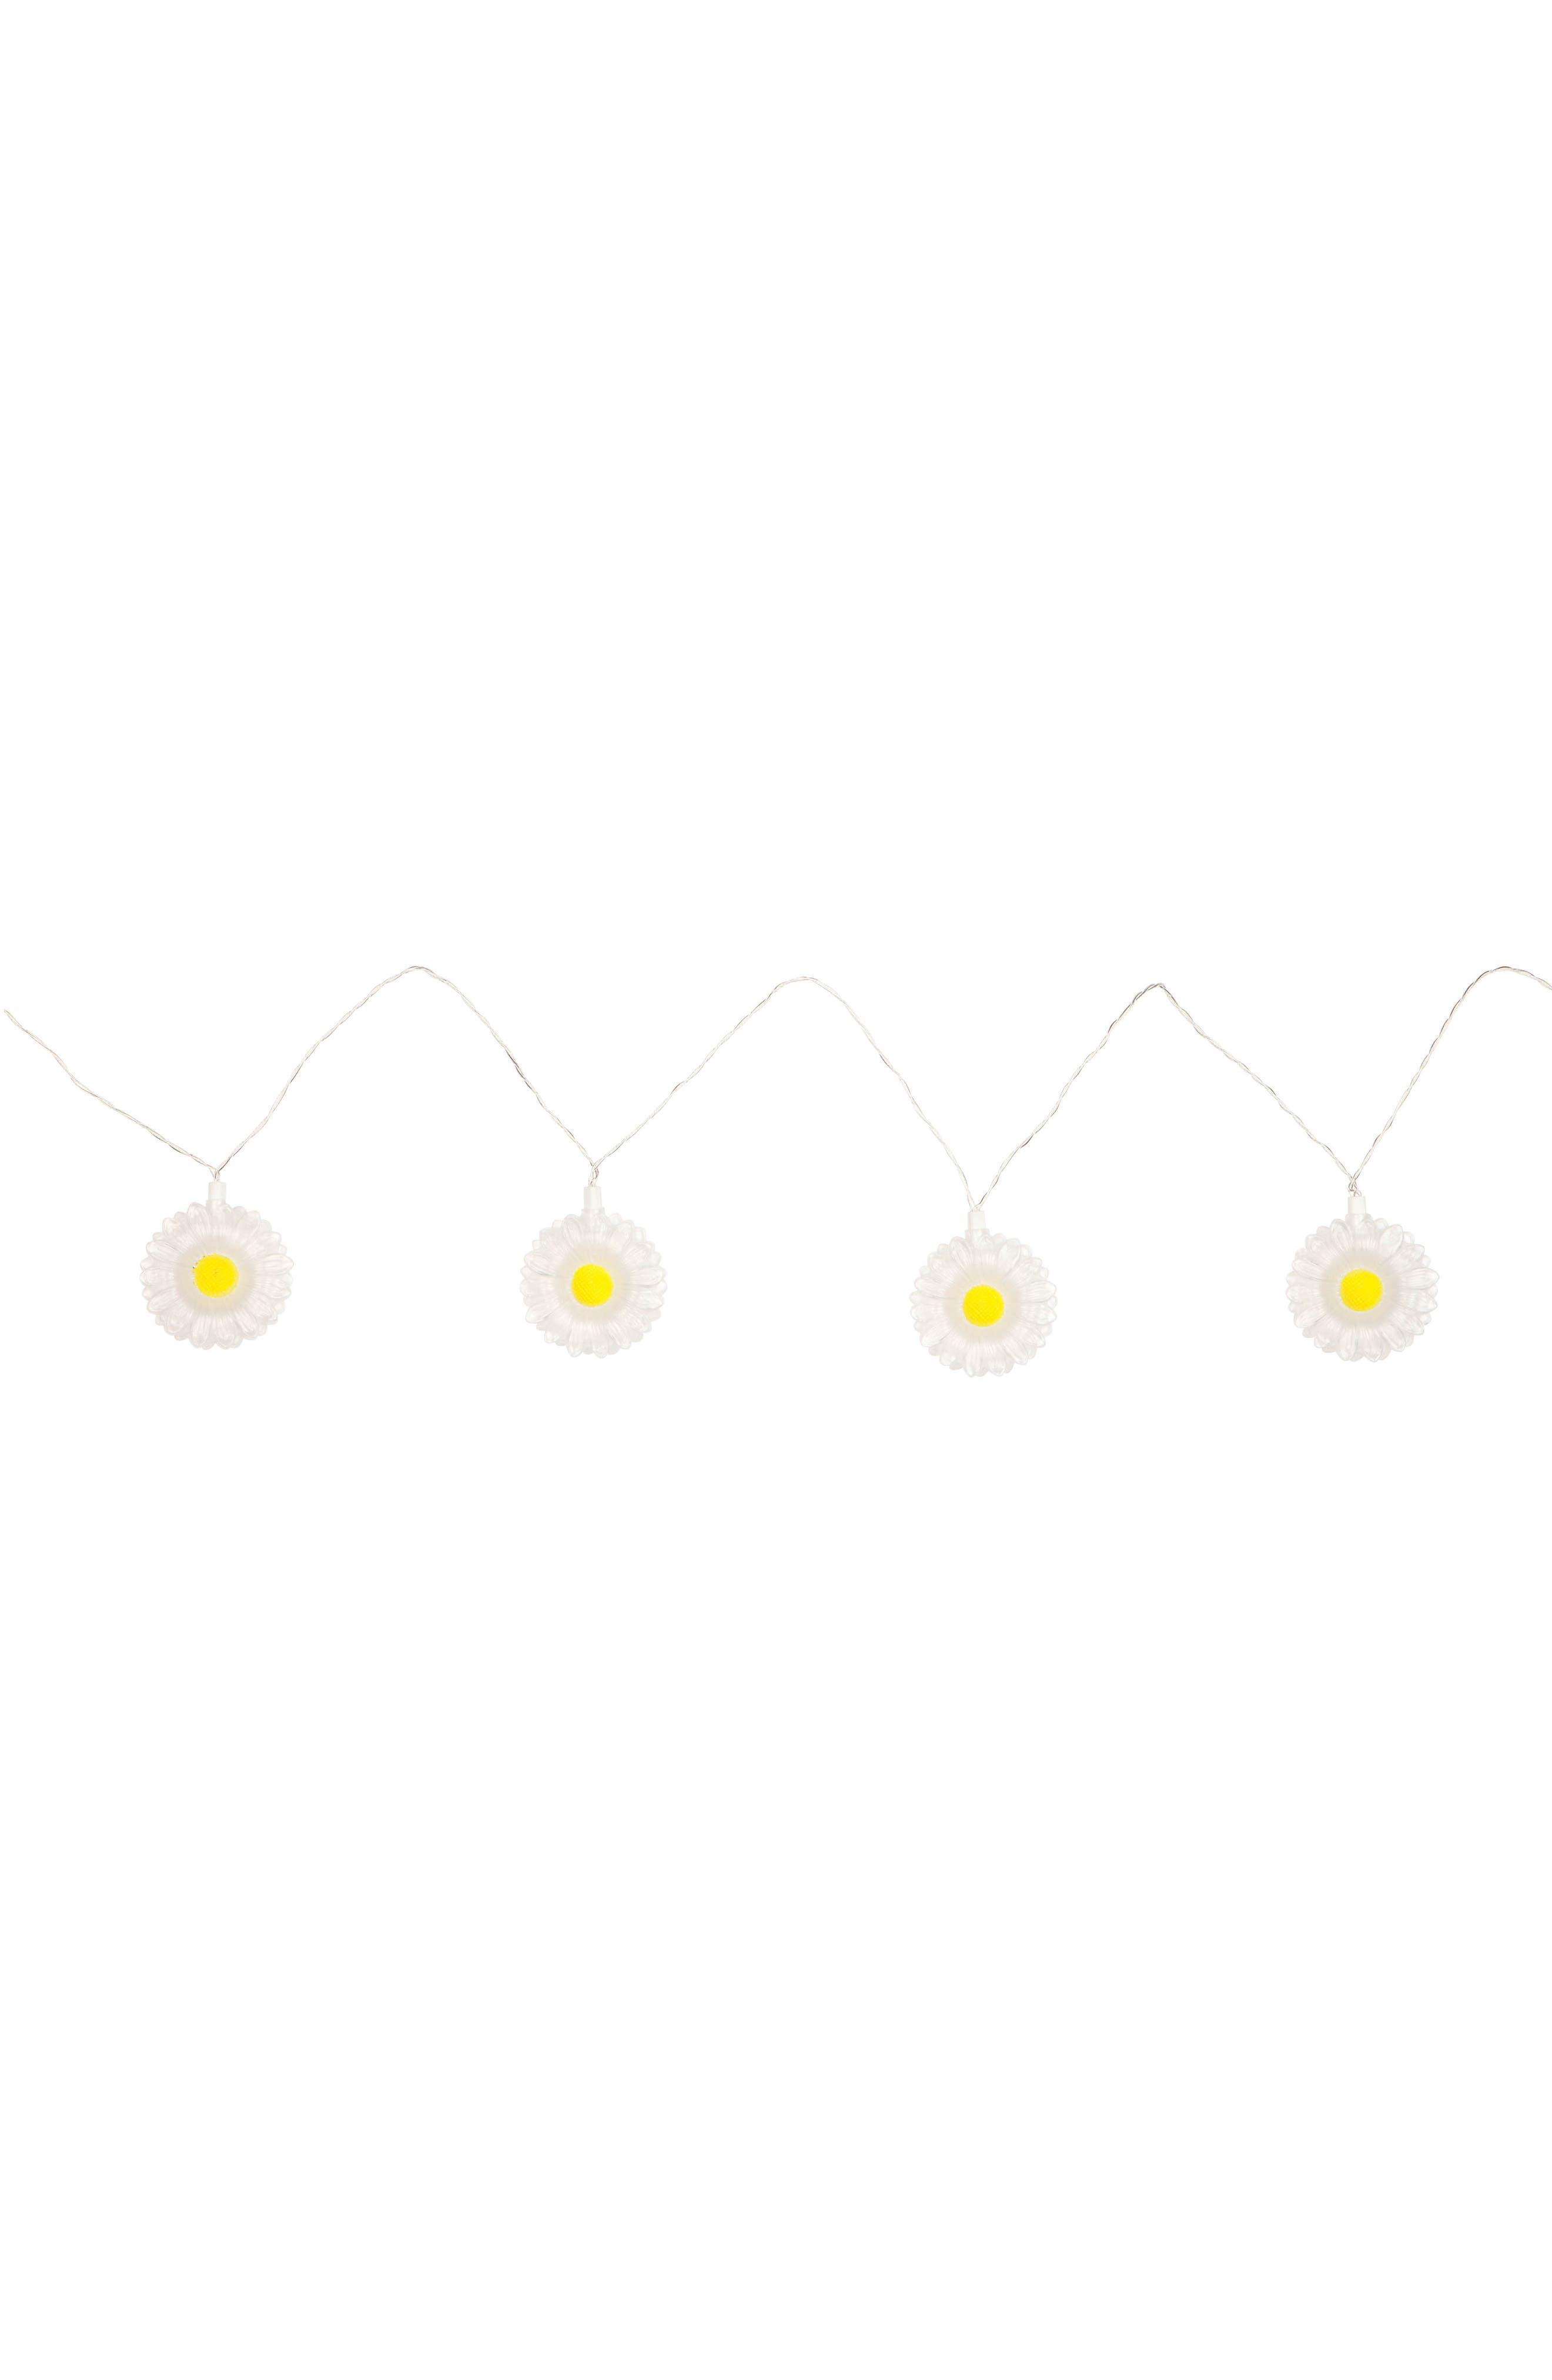 Sunnylife Daisy Battery Powered String Lights